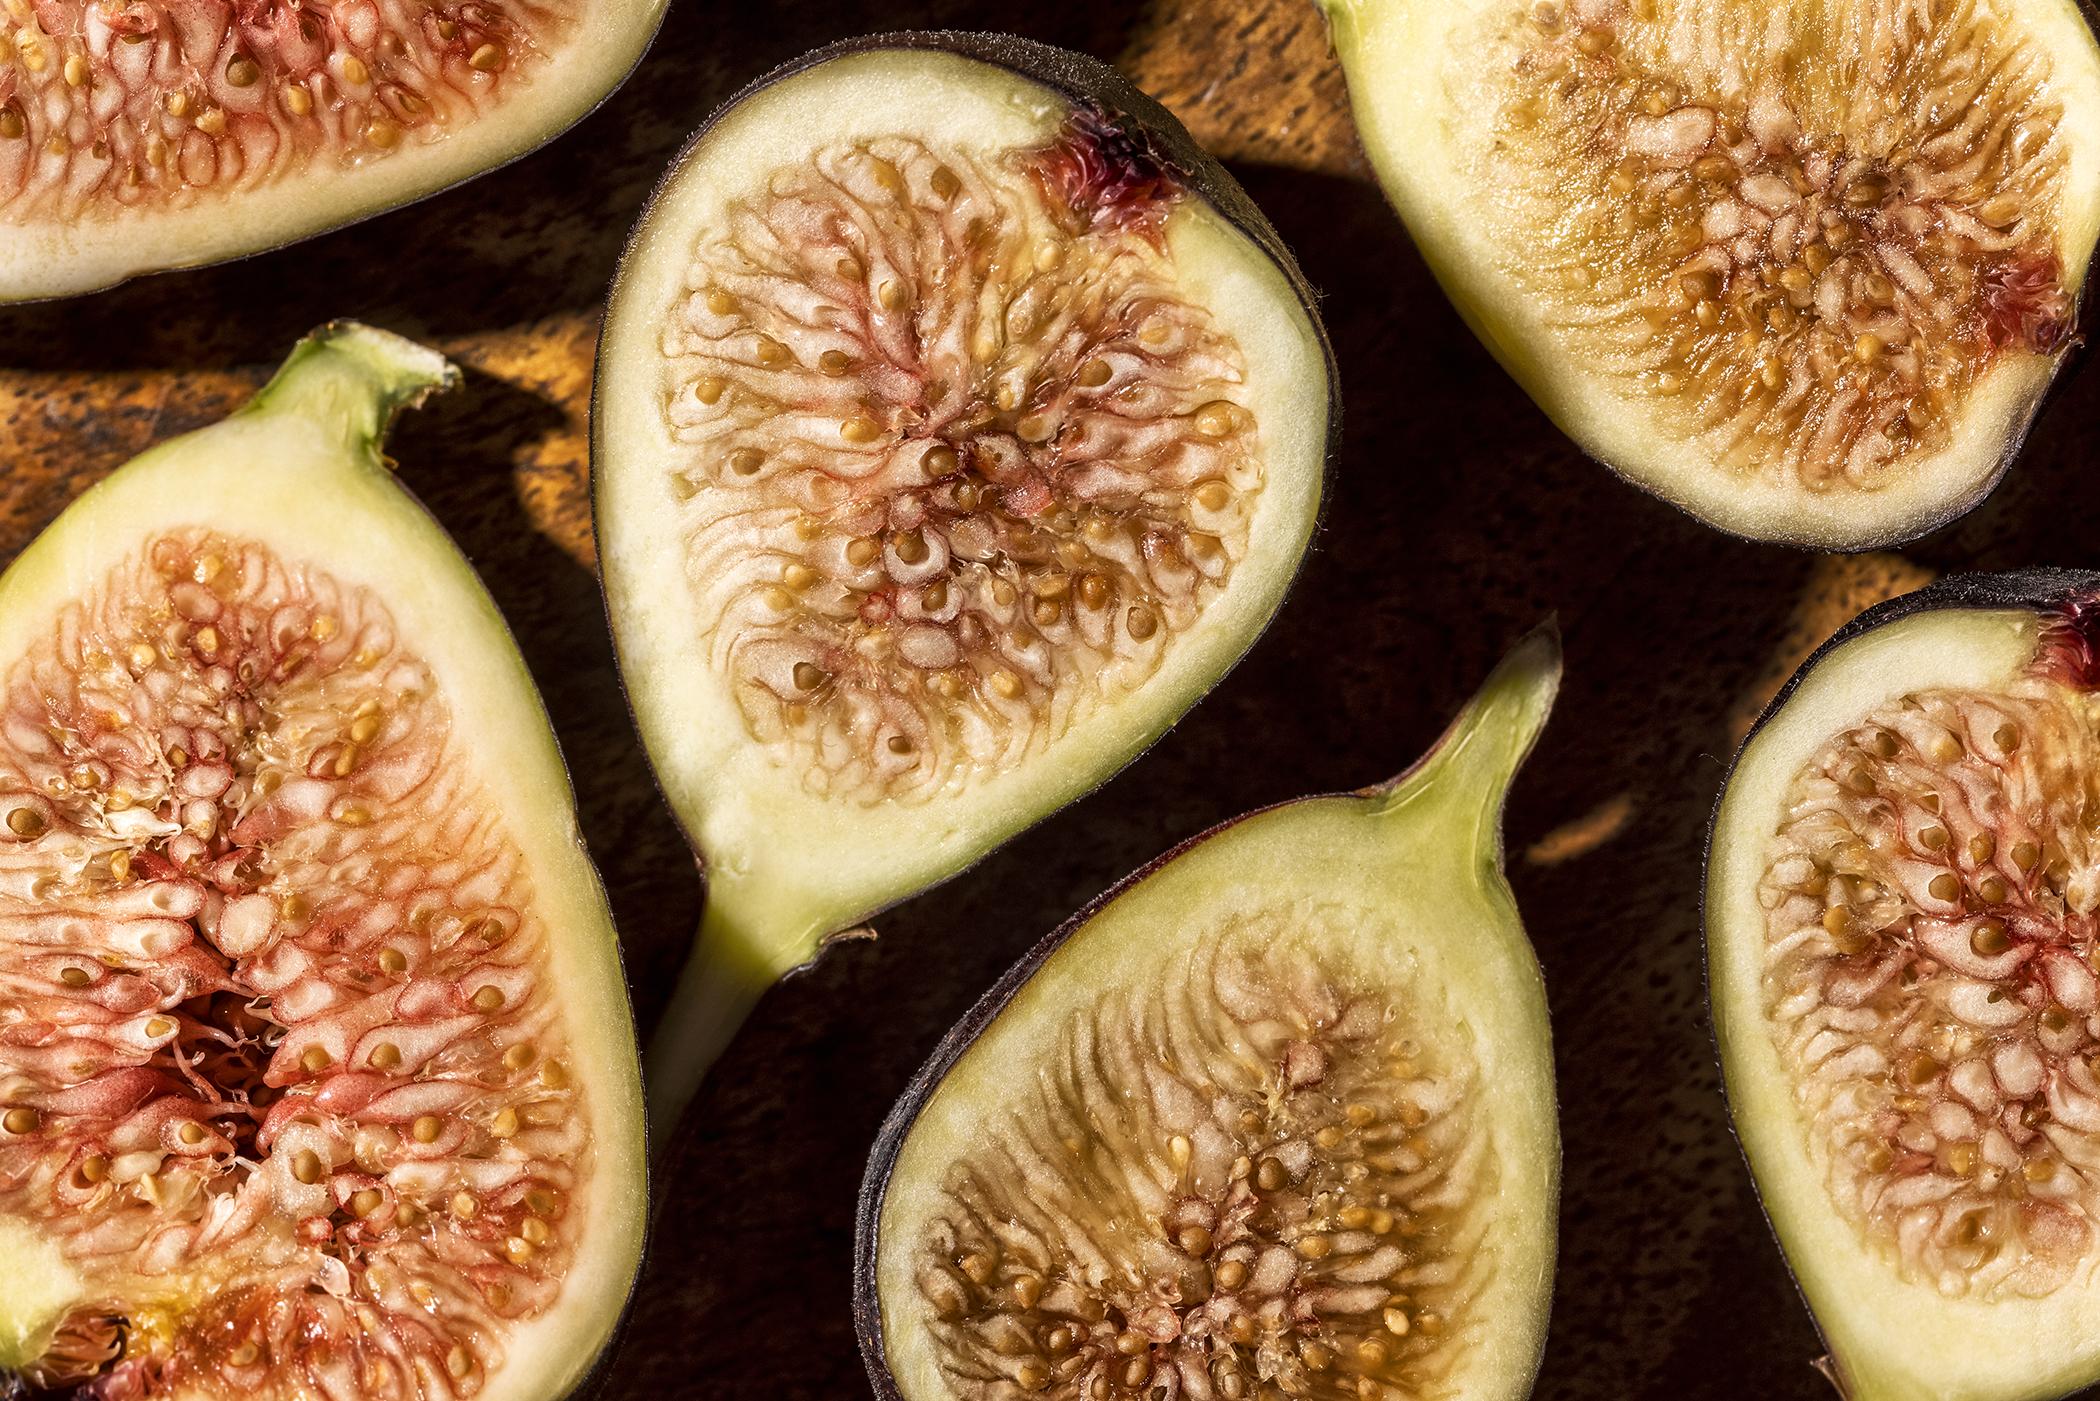 figs, fruit garnish, dessert recipe, organic fruit